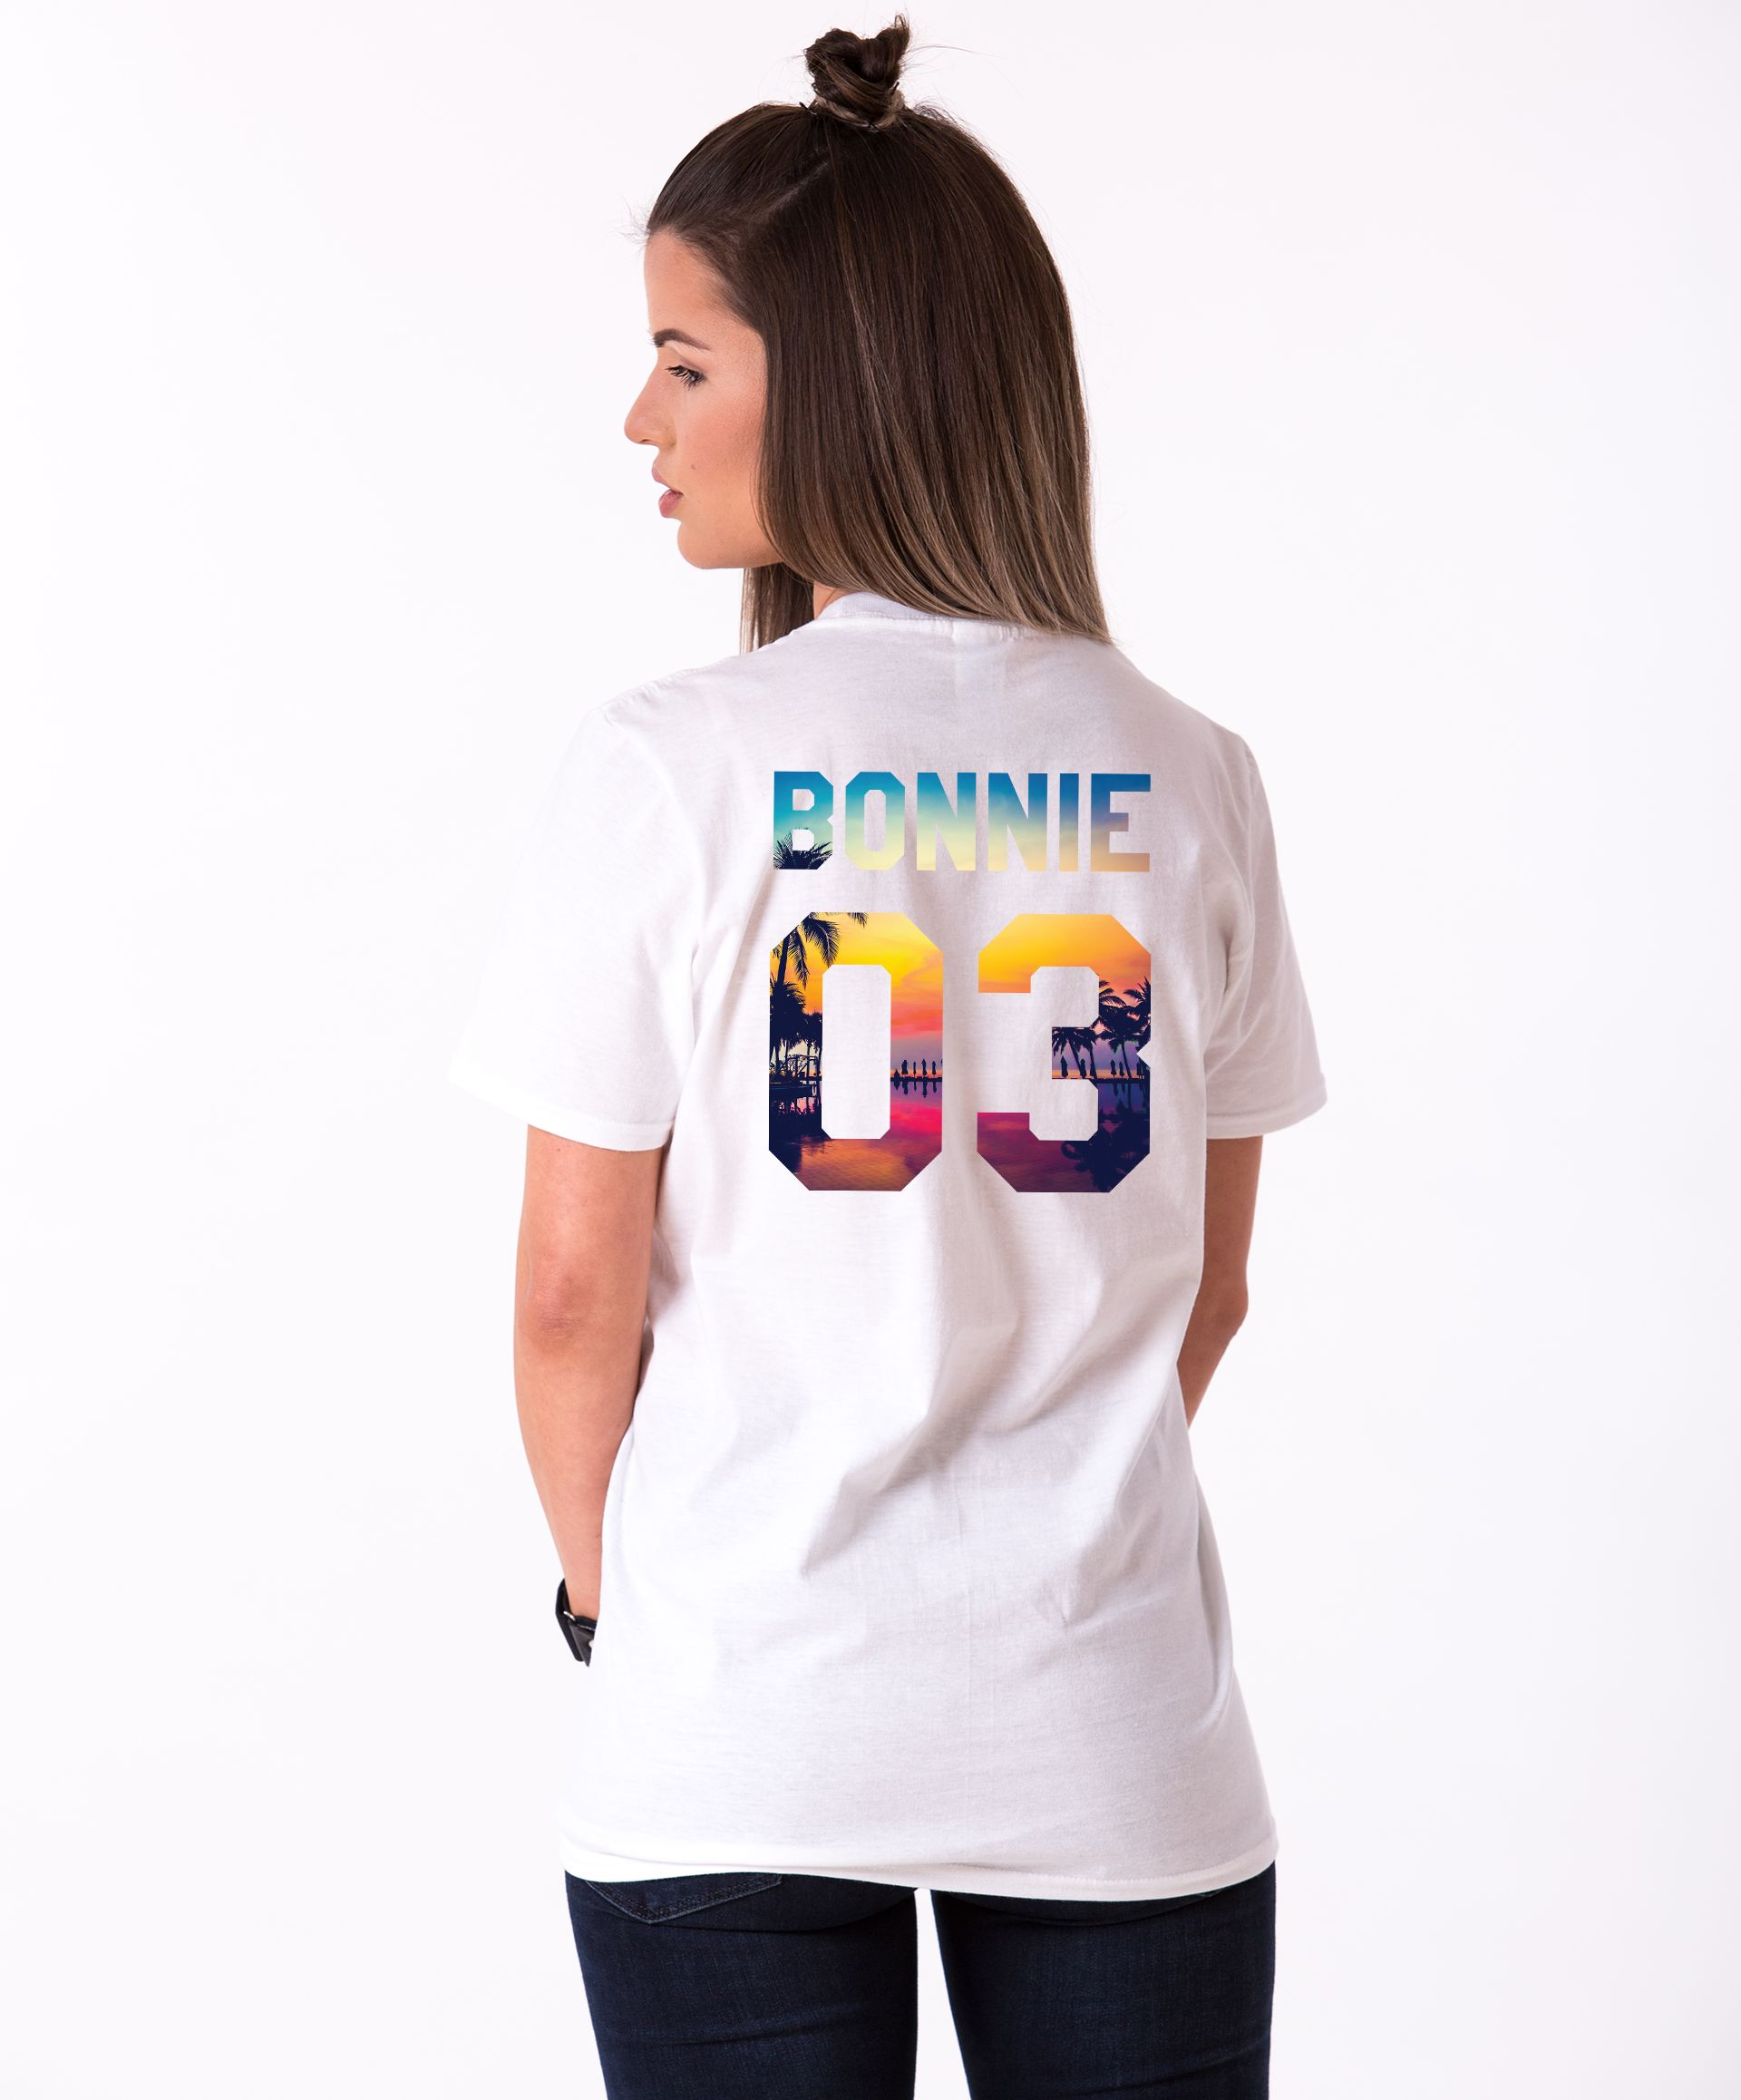 Summer T-shirts Bonnie /& Clyde Tropical Imprimé couple Tees Son et Sien NEUF